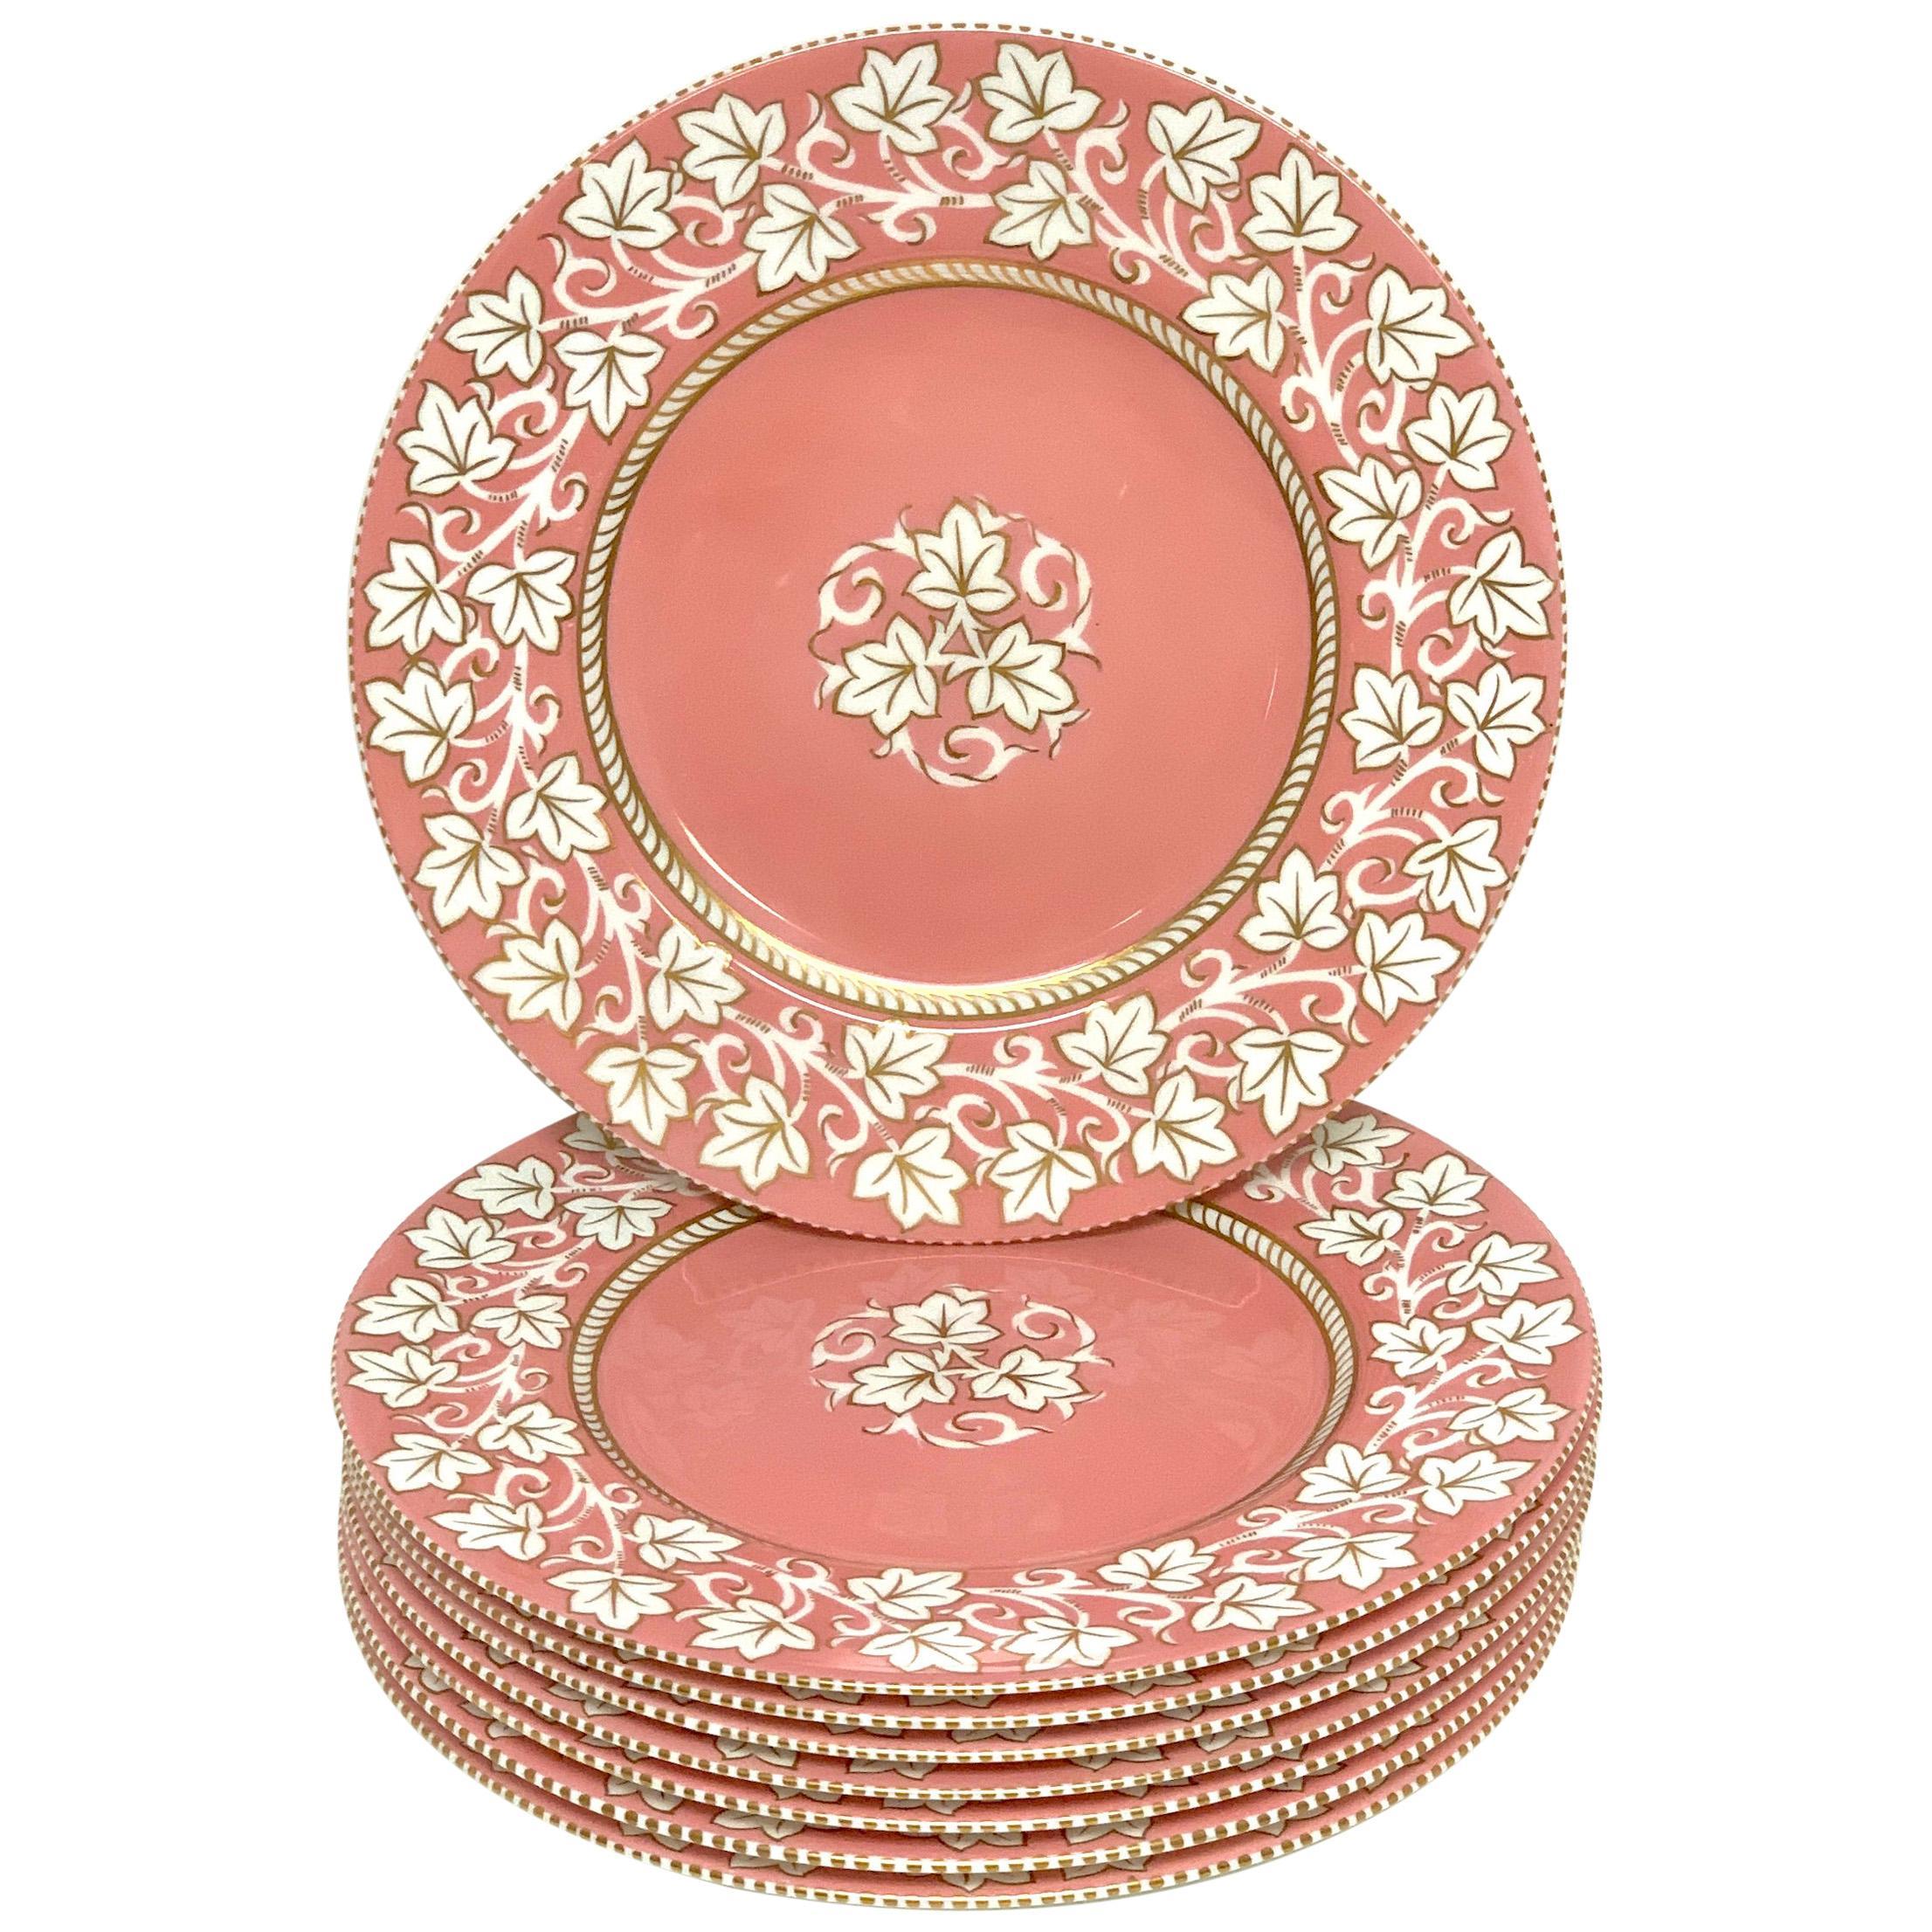 8 Stunning Hollywood Regency Wedgwood Pink Lustre Service Plates